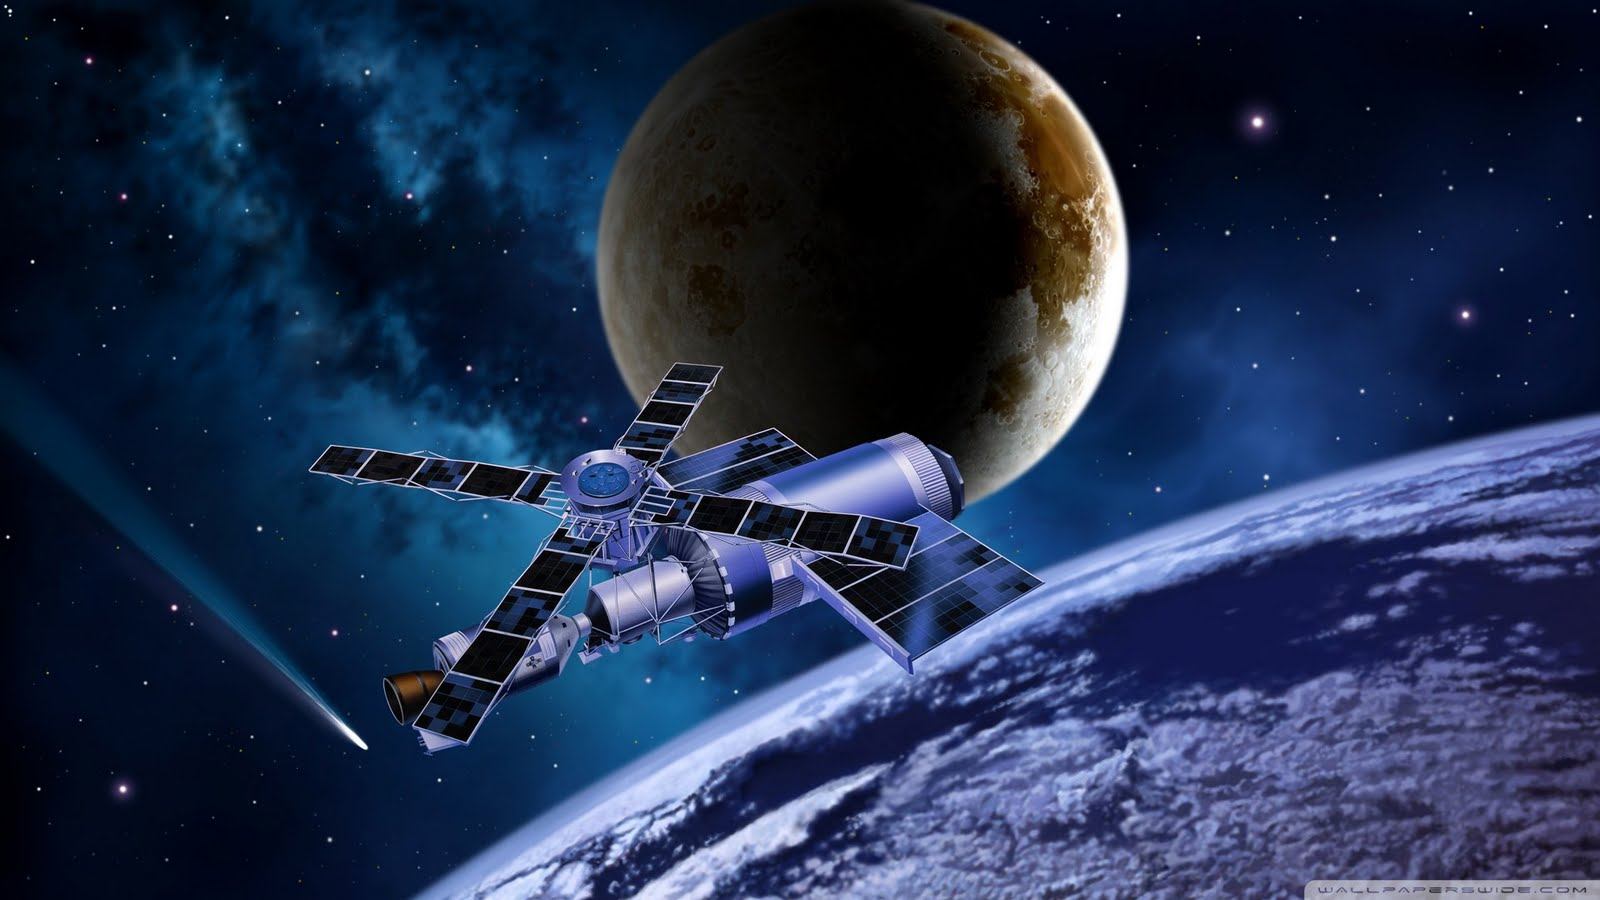 Satellite hd - Satellite wallpaper hd ...